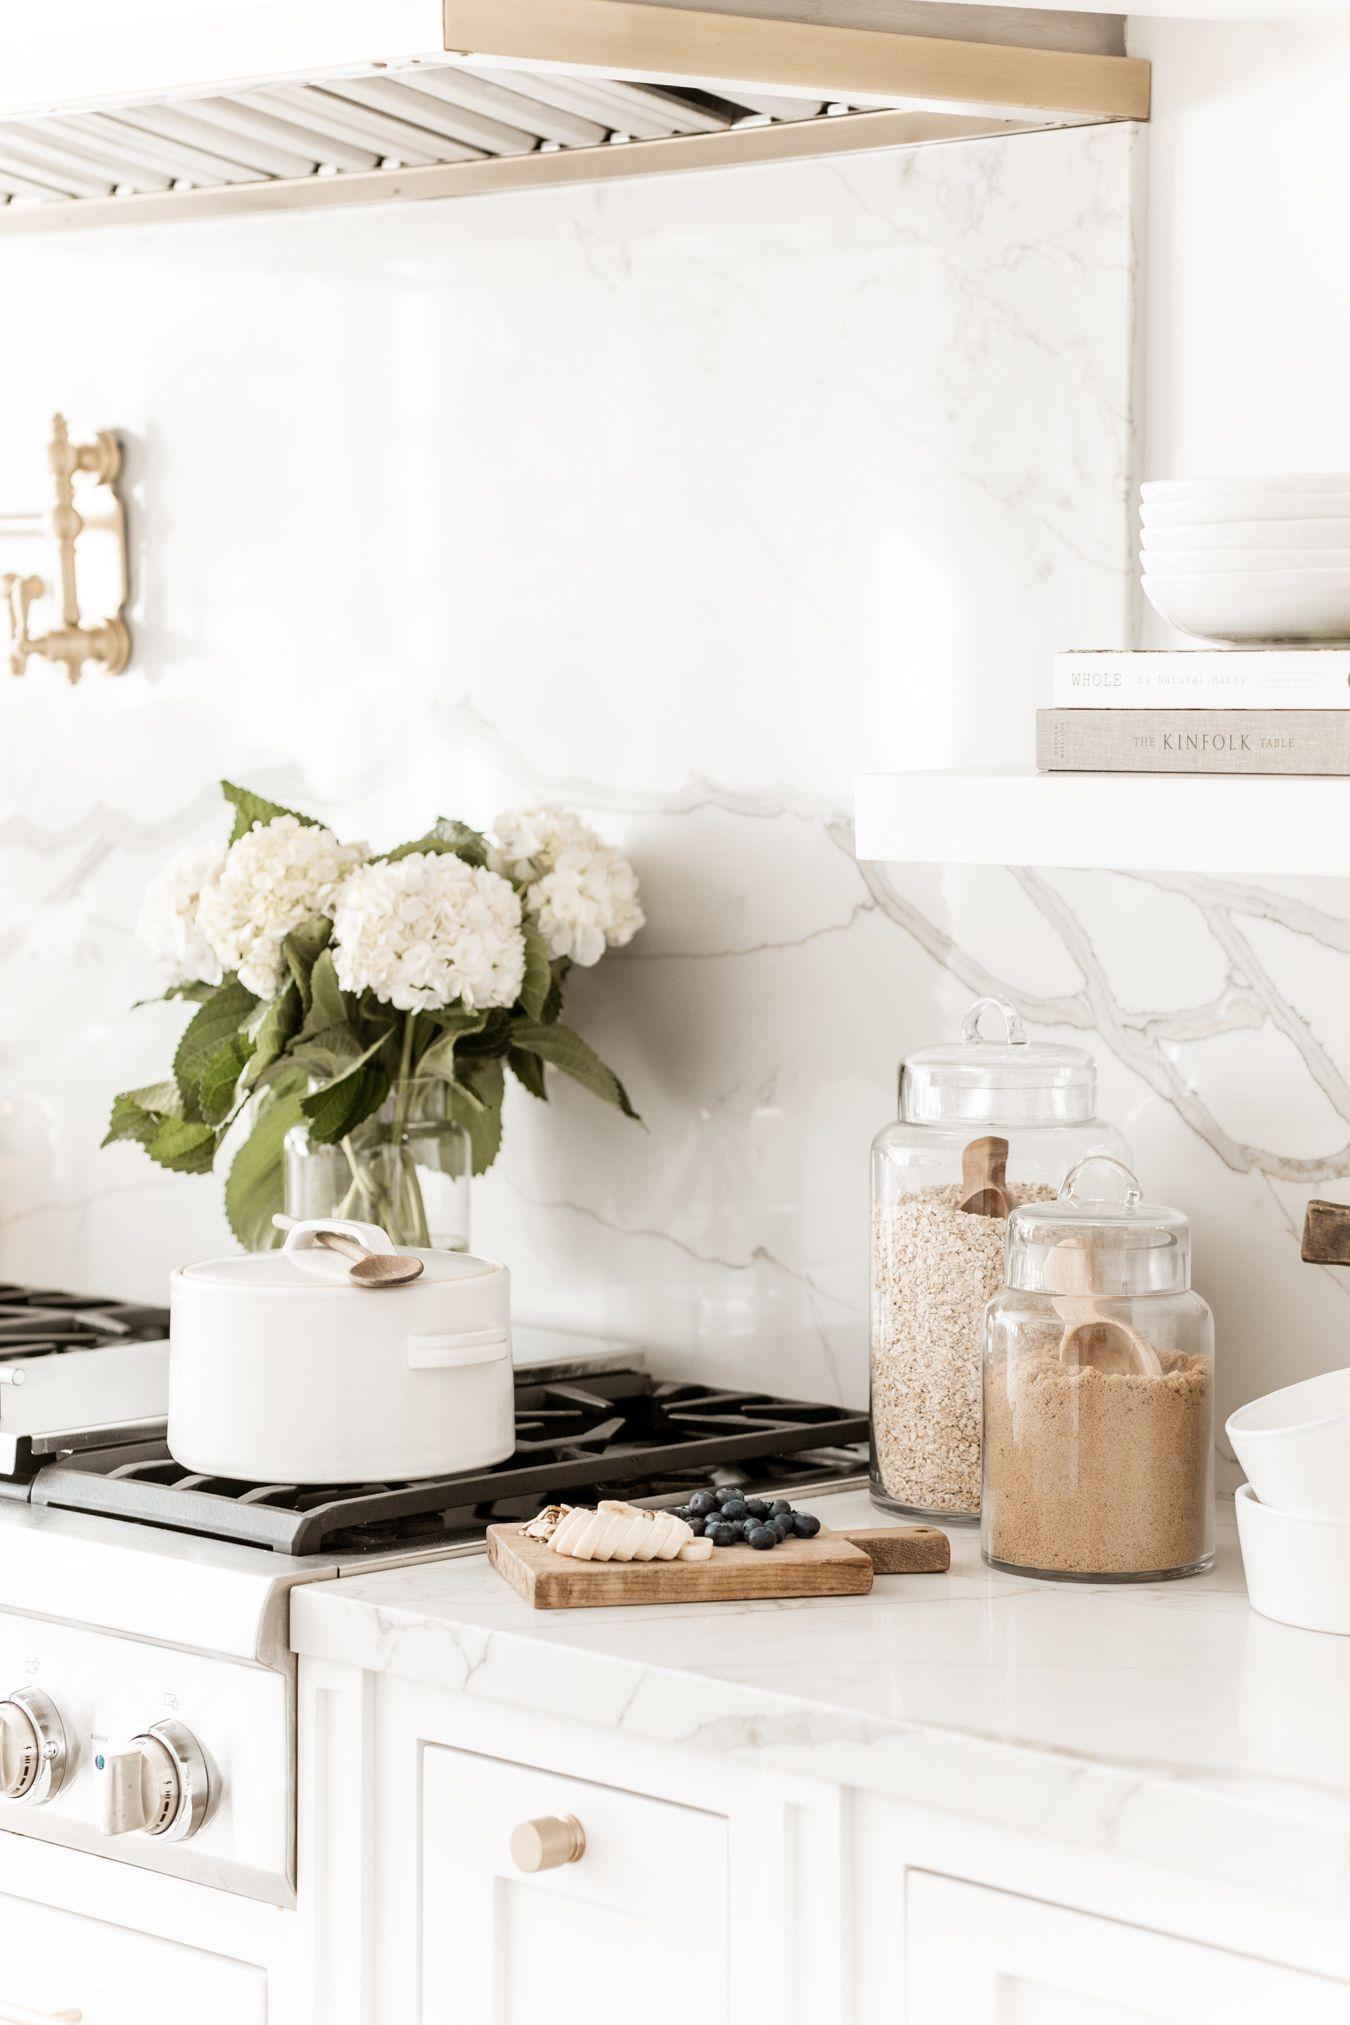 Mason Jar Spoon Rest White Stove Kitchen Counter Home Decor Baking Cooking New